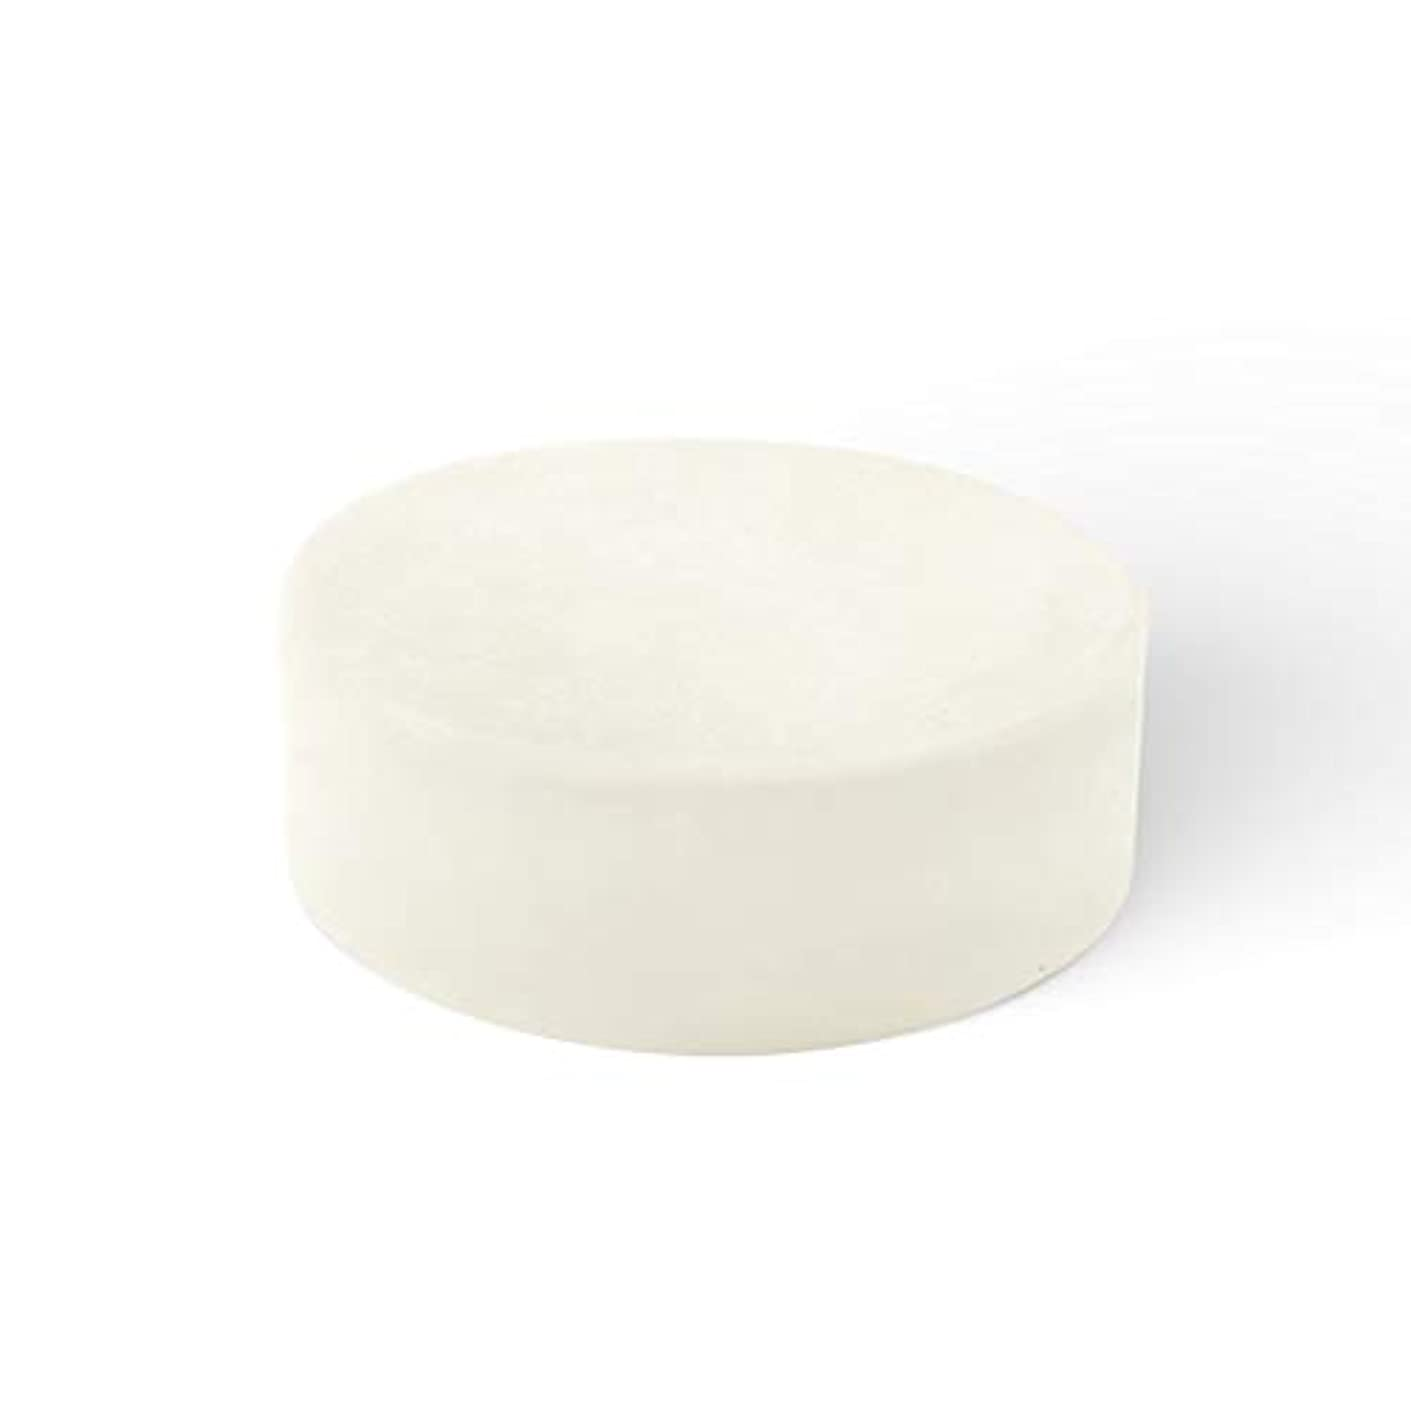 Profeel オーガニックシャンプーバー石鹸髪の成長コンディショナー修復髪の保護のための手作り石鹸